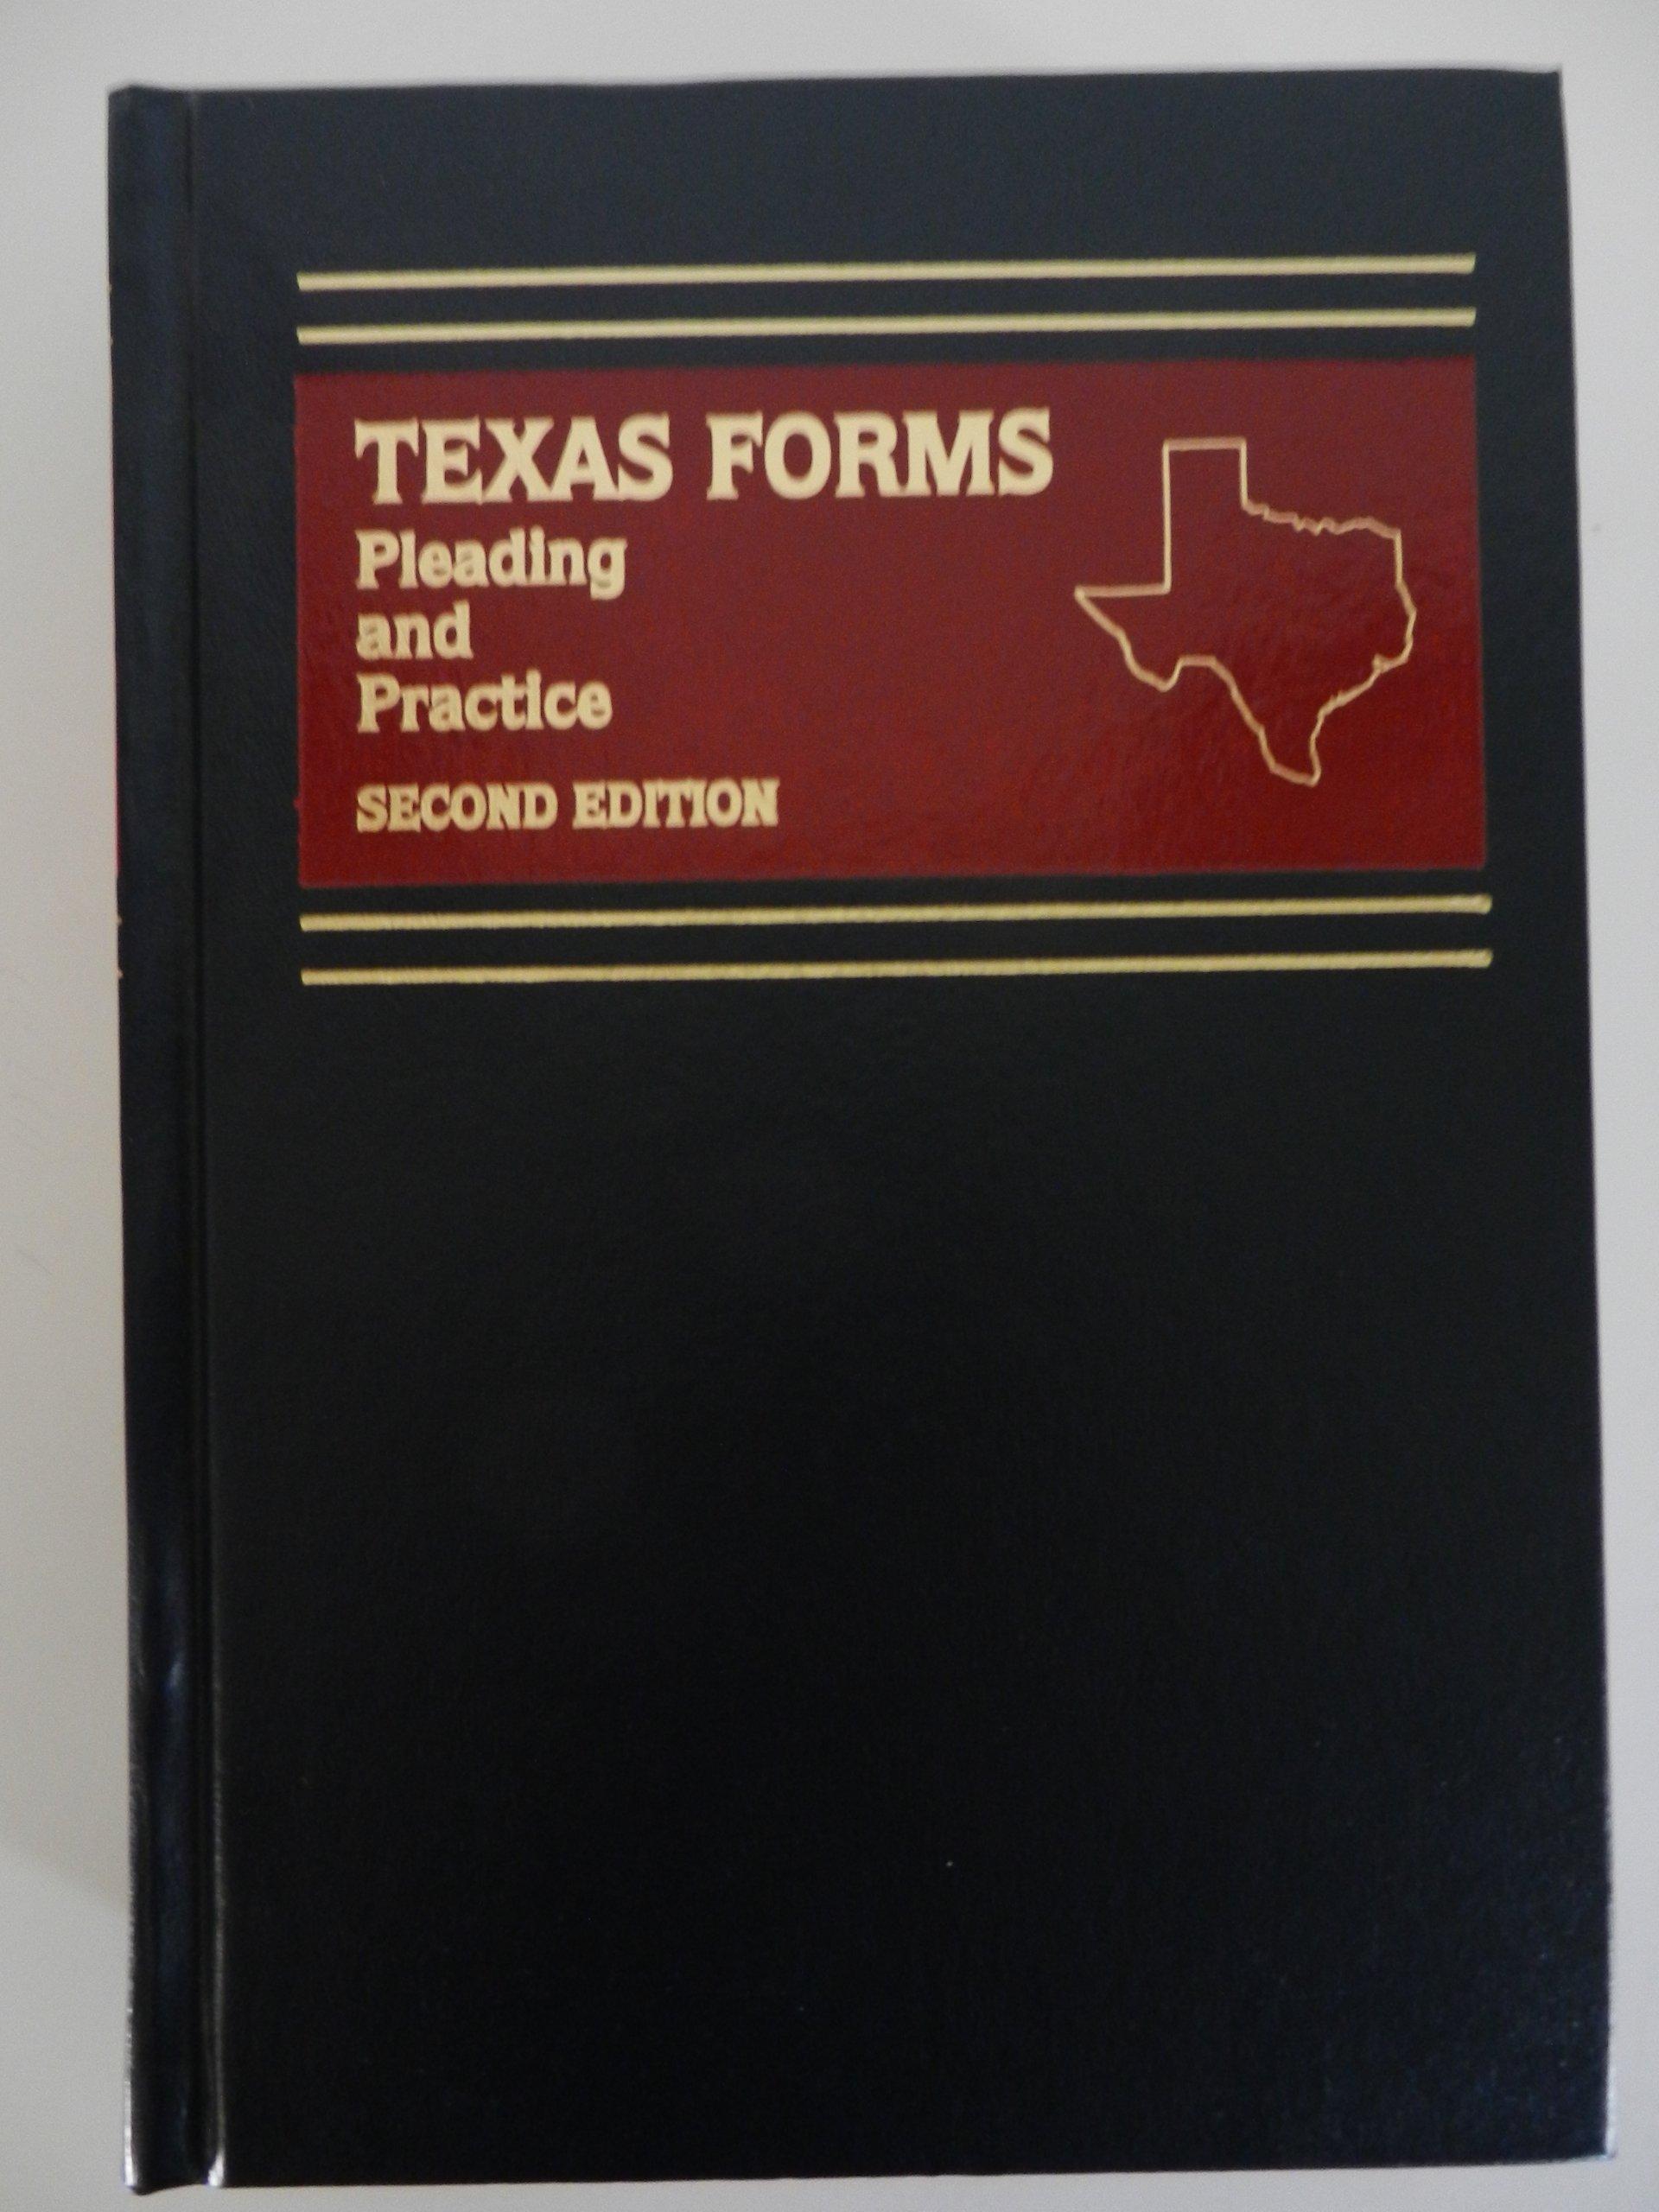 Texas Landlord Tenant Forms